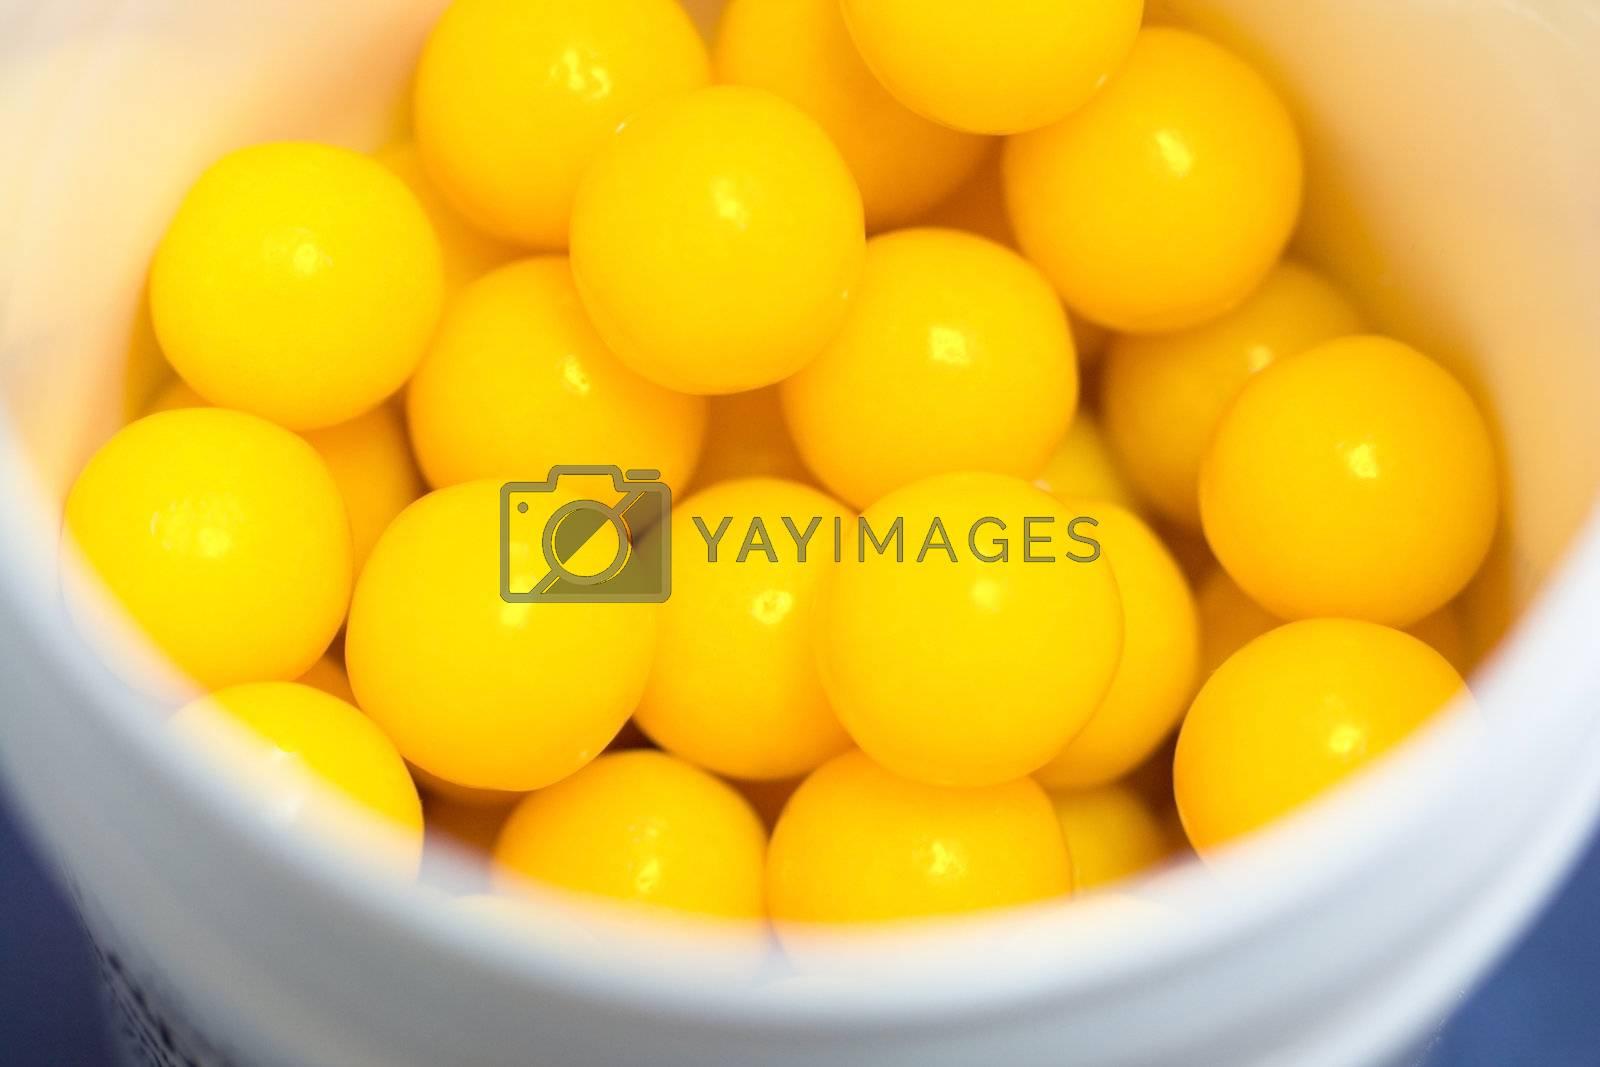 gallipot with vitamin pills, focused on pills